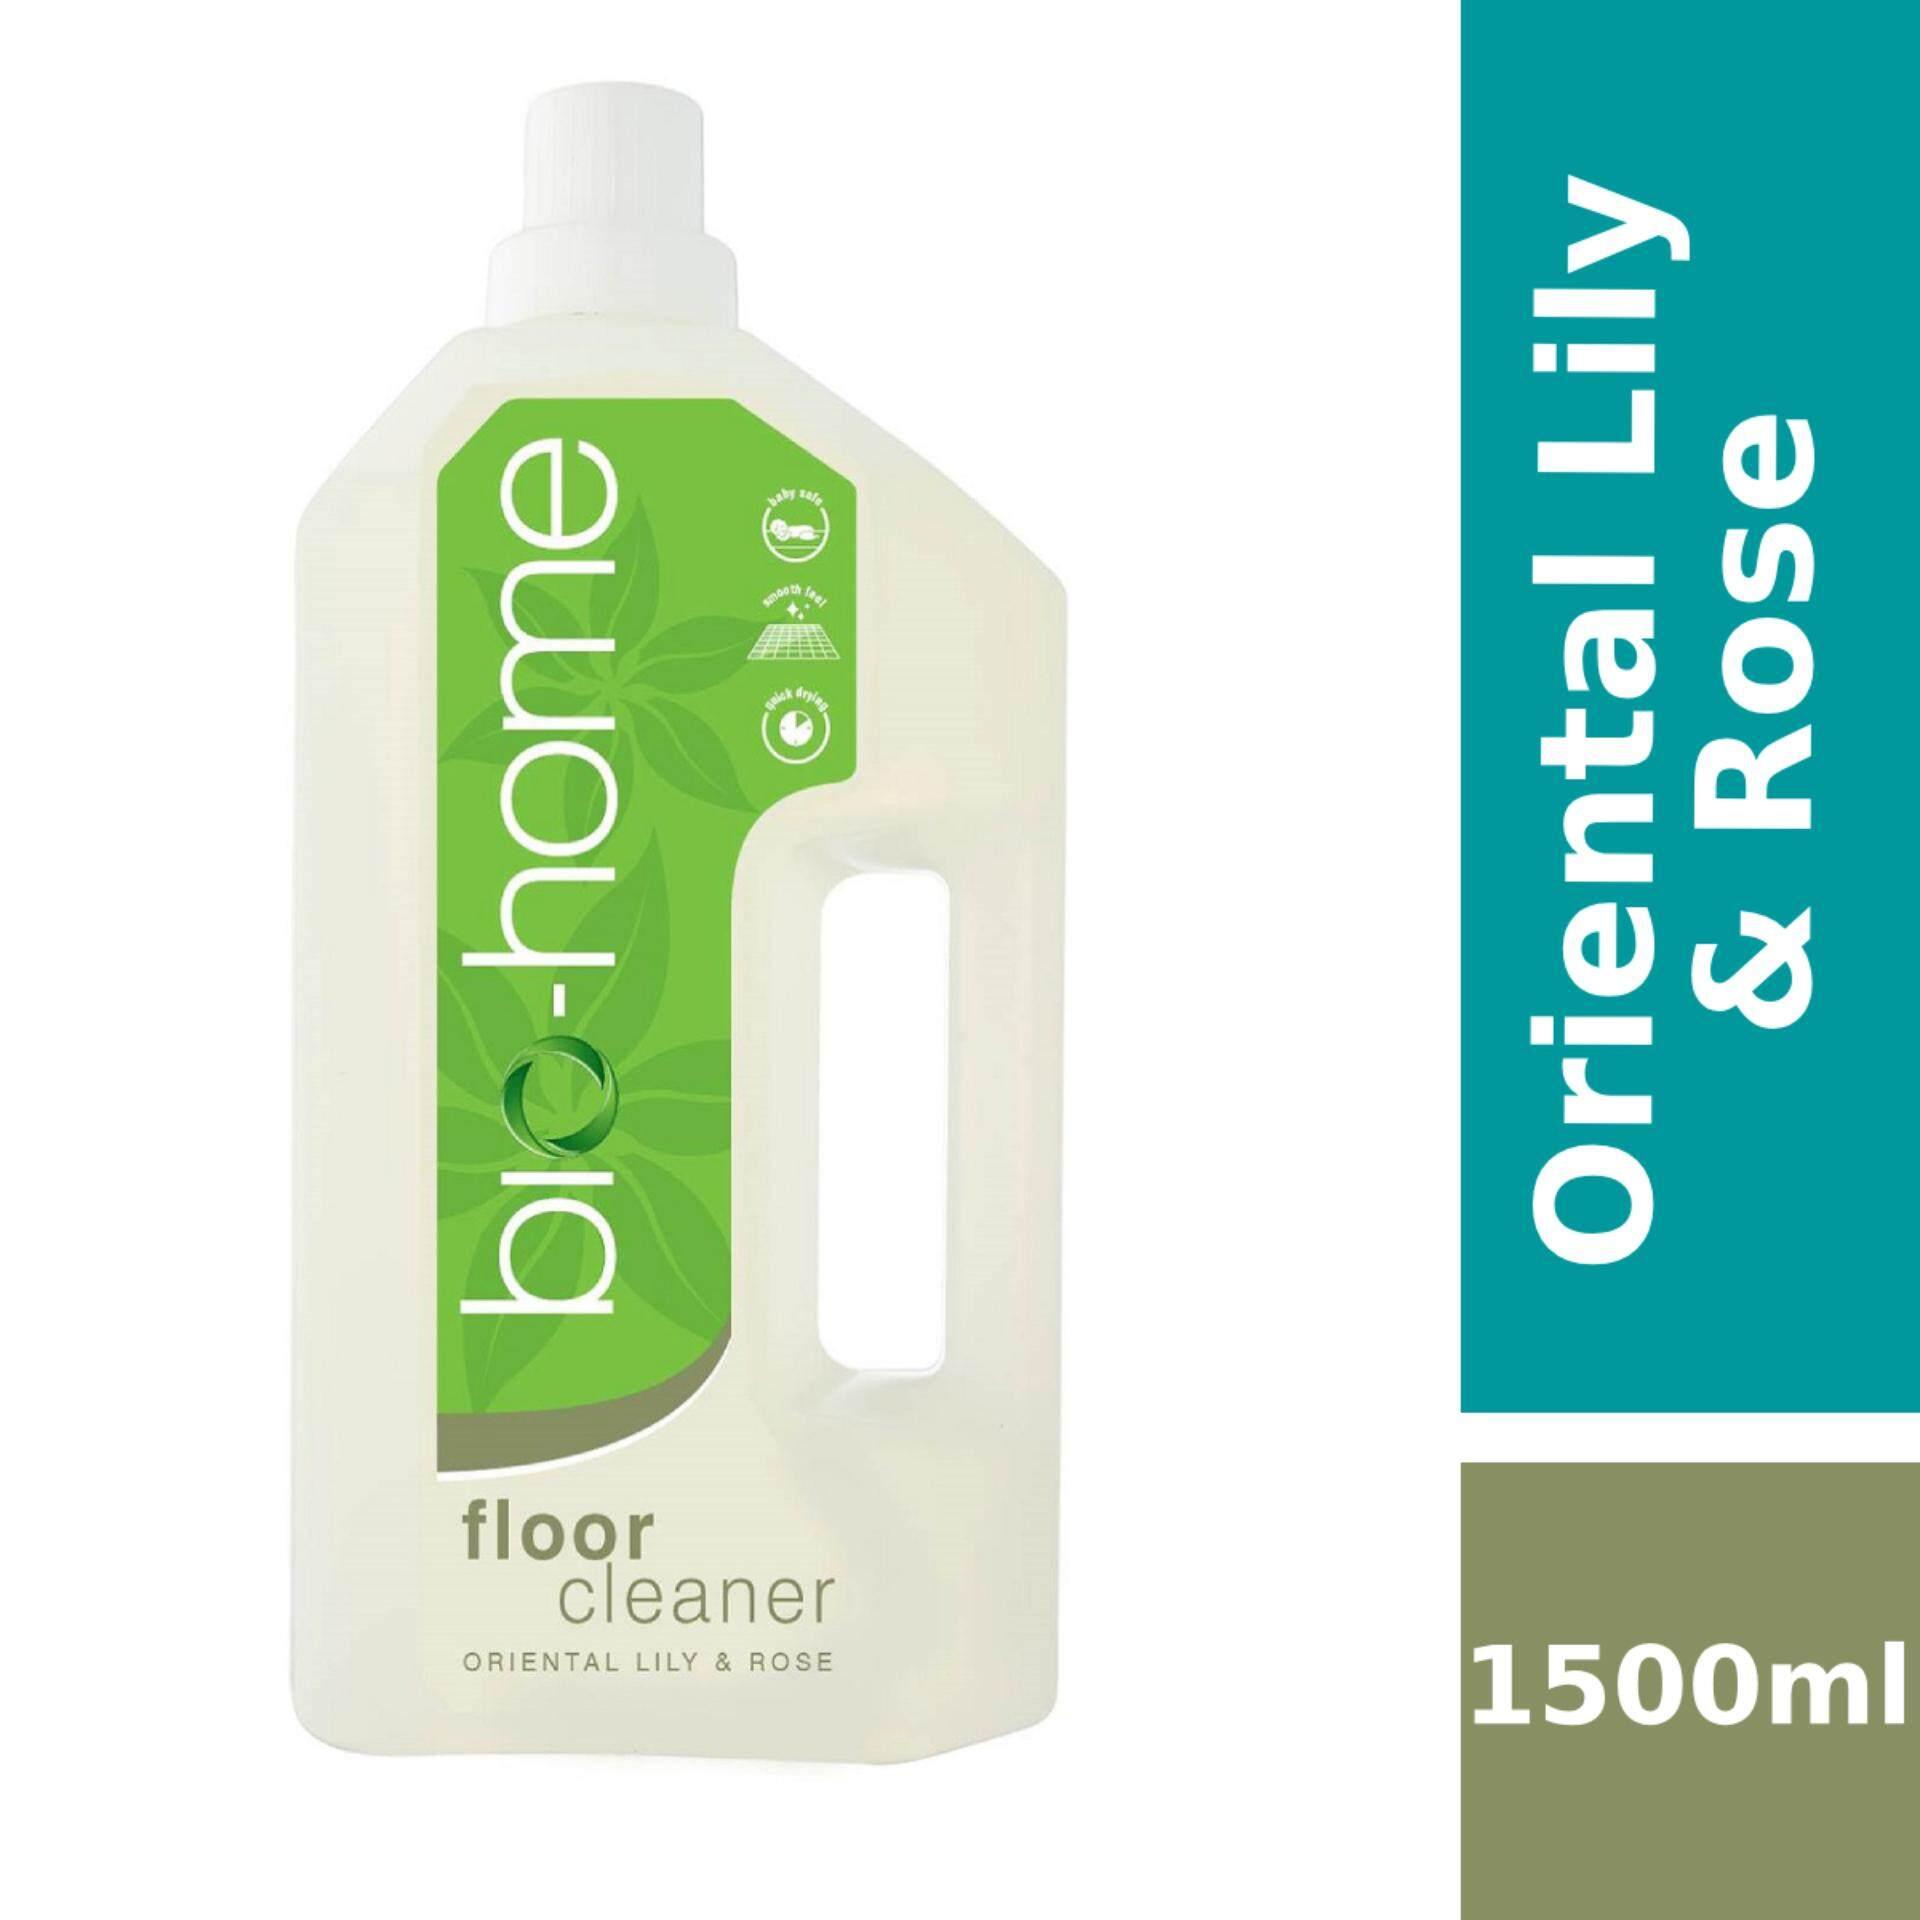 bio-home Floor Cleaner (Oriental Lily & Rose) 1500ml